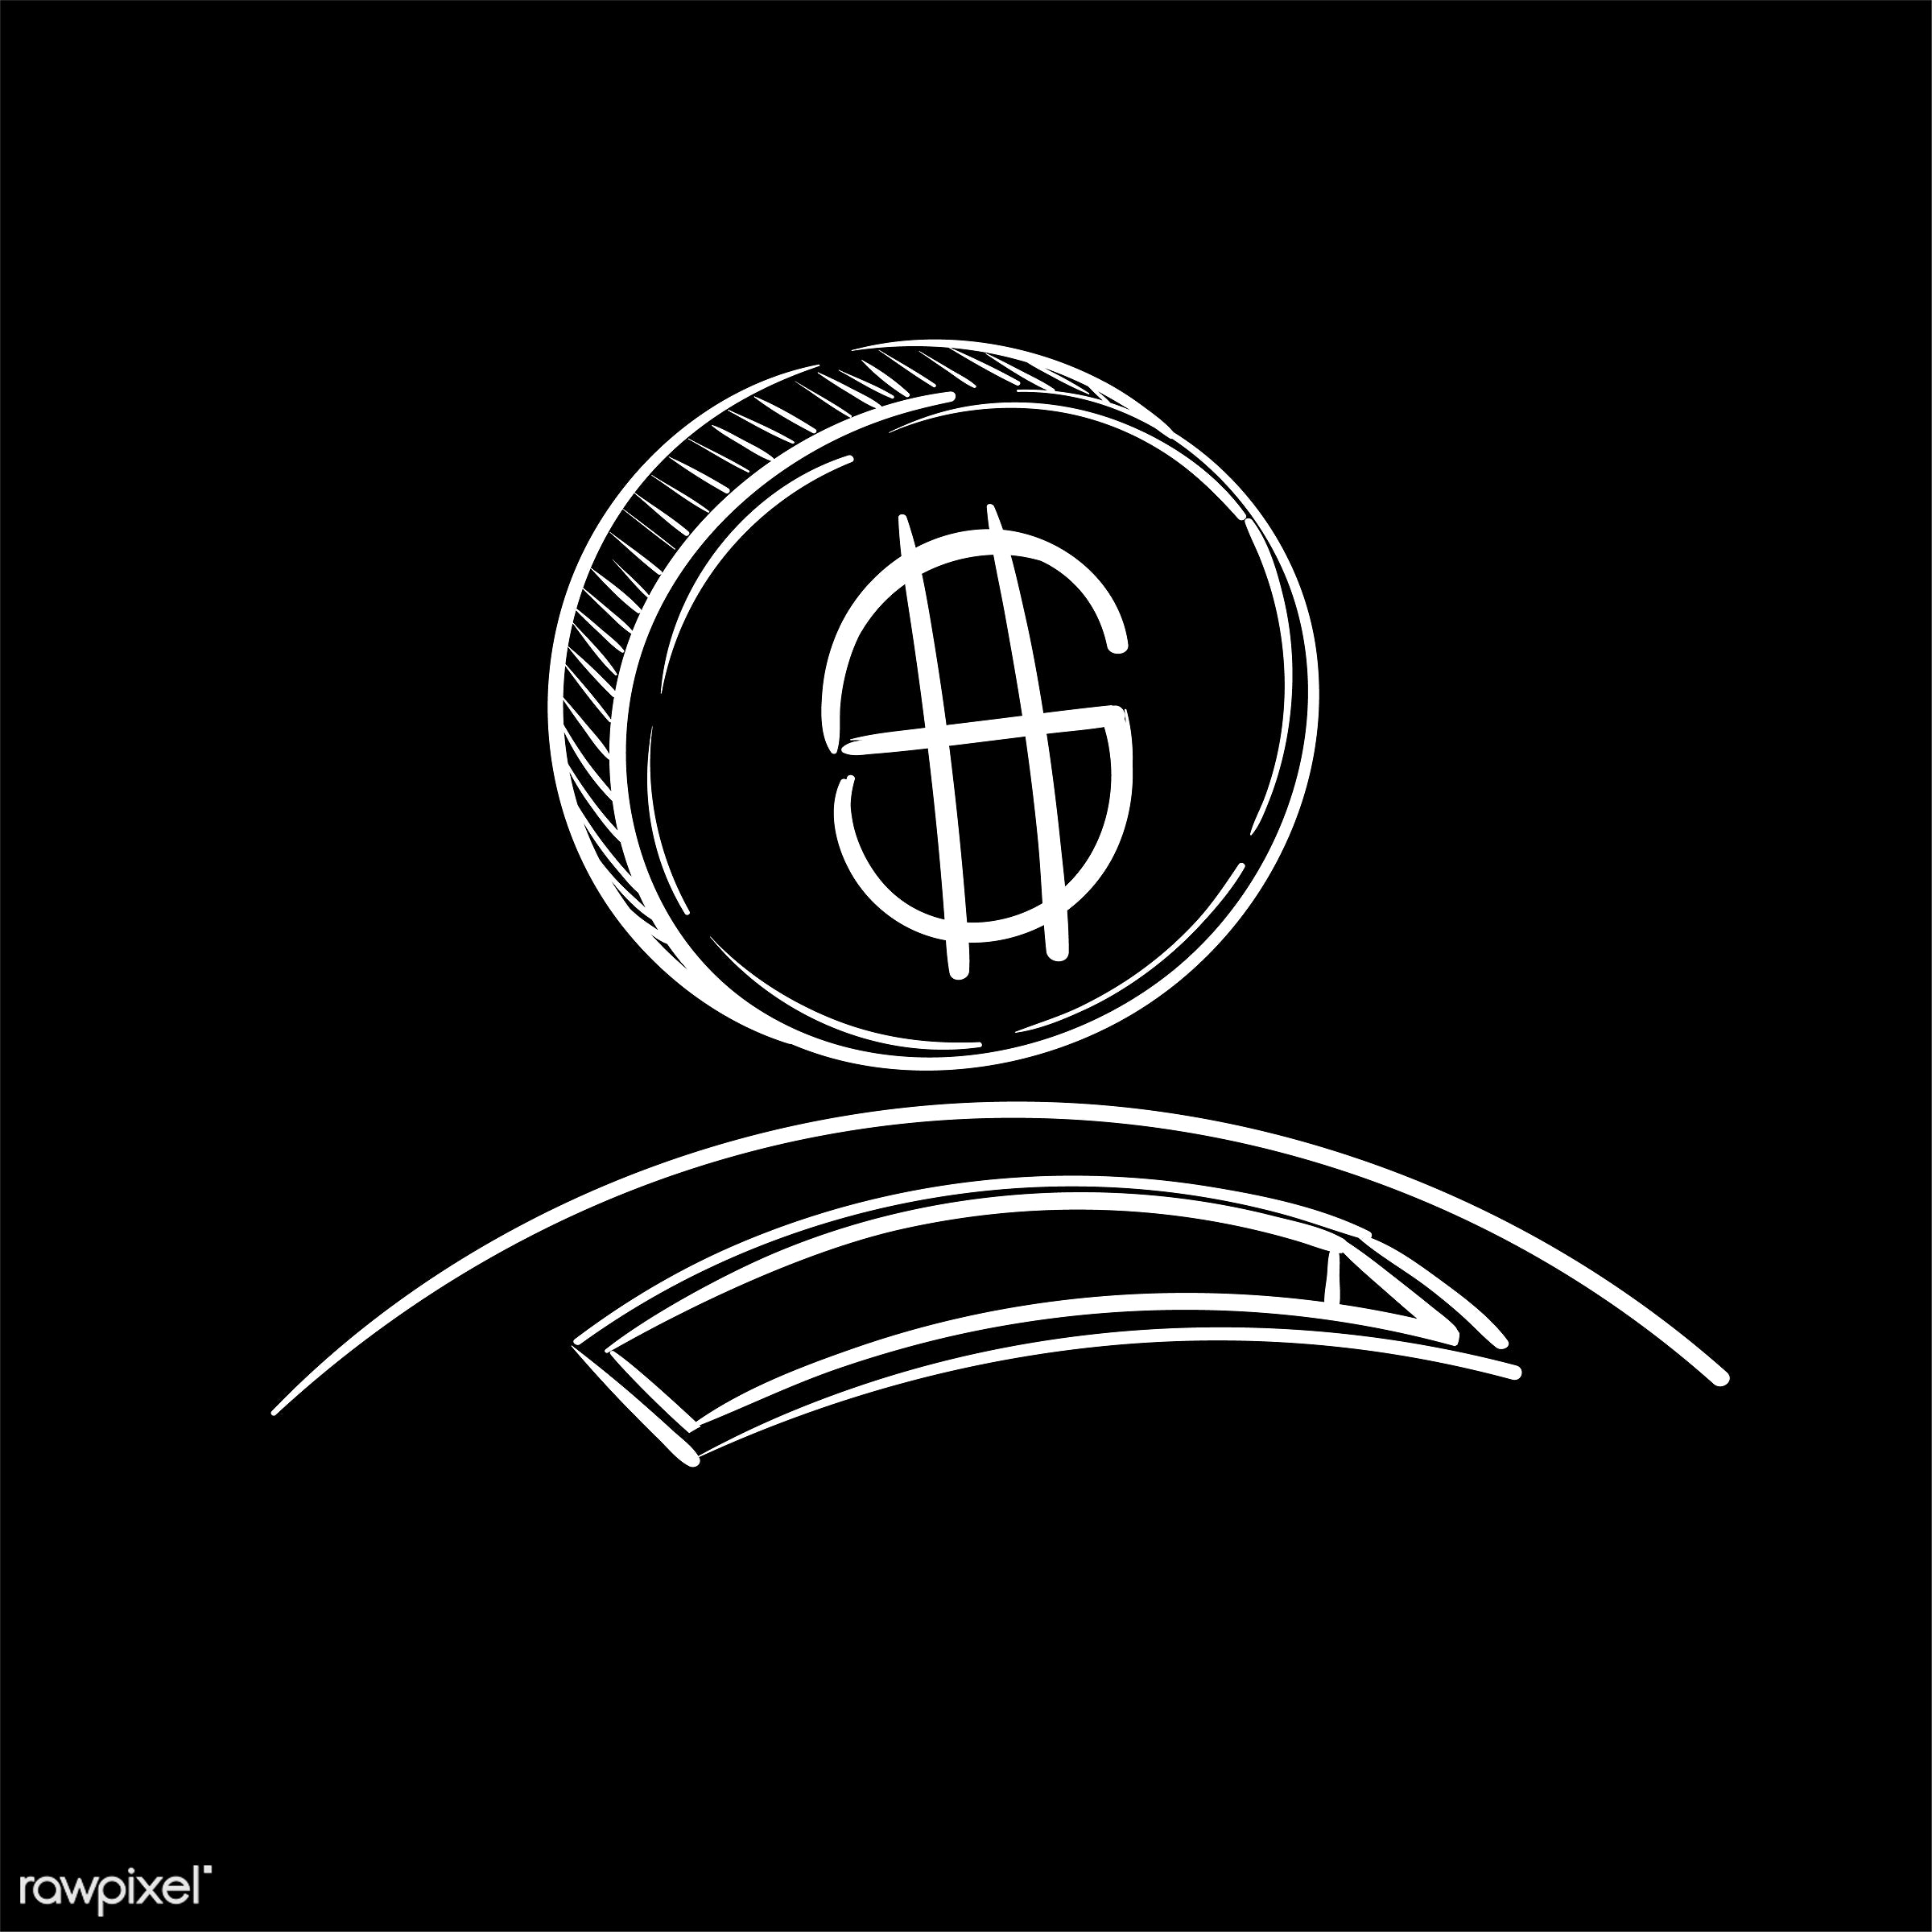 art, artwork, business, cash, commerce, creative, creativity, design, draw, drawing, drawn, earns, economic, economy,...